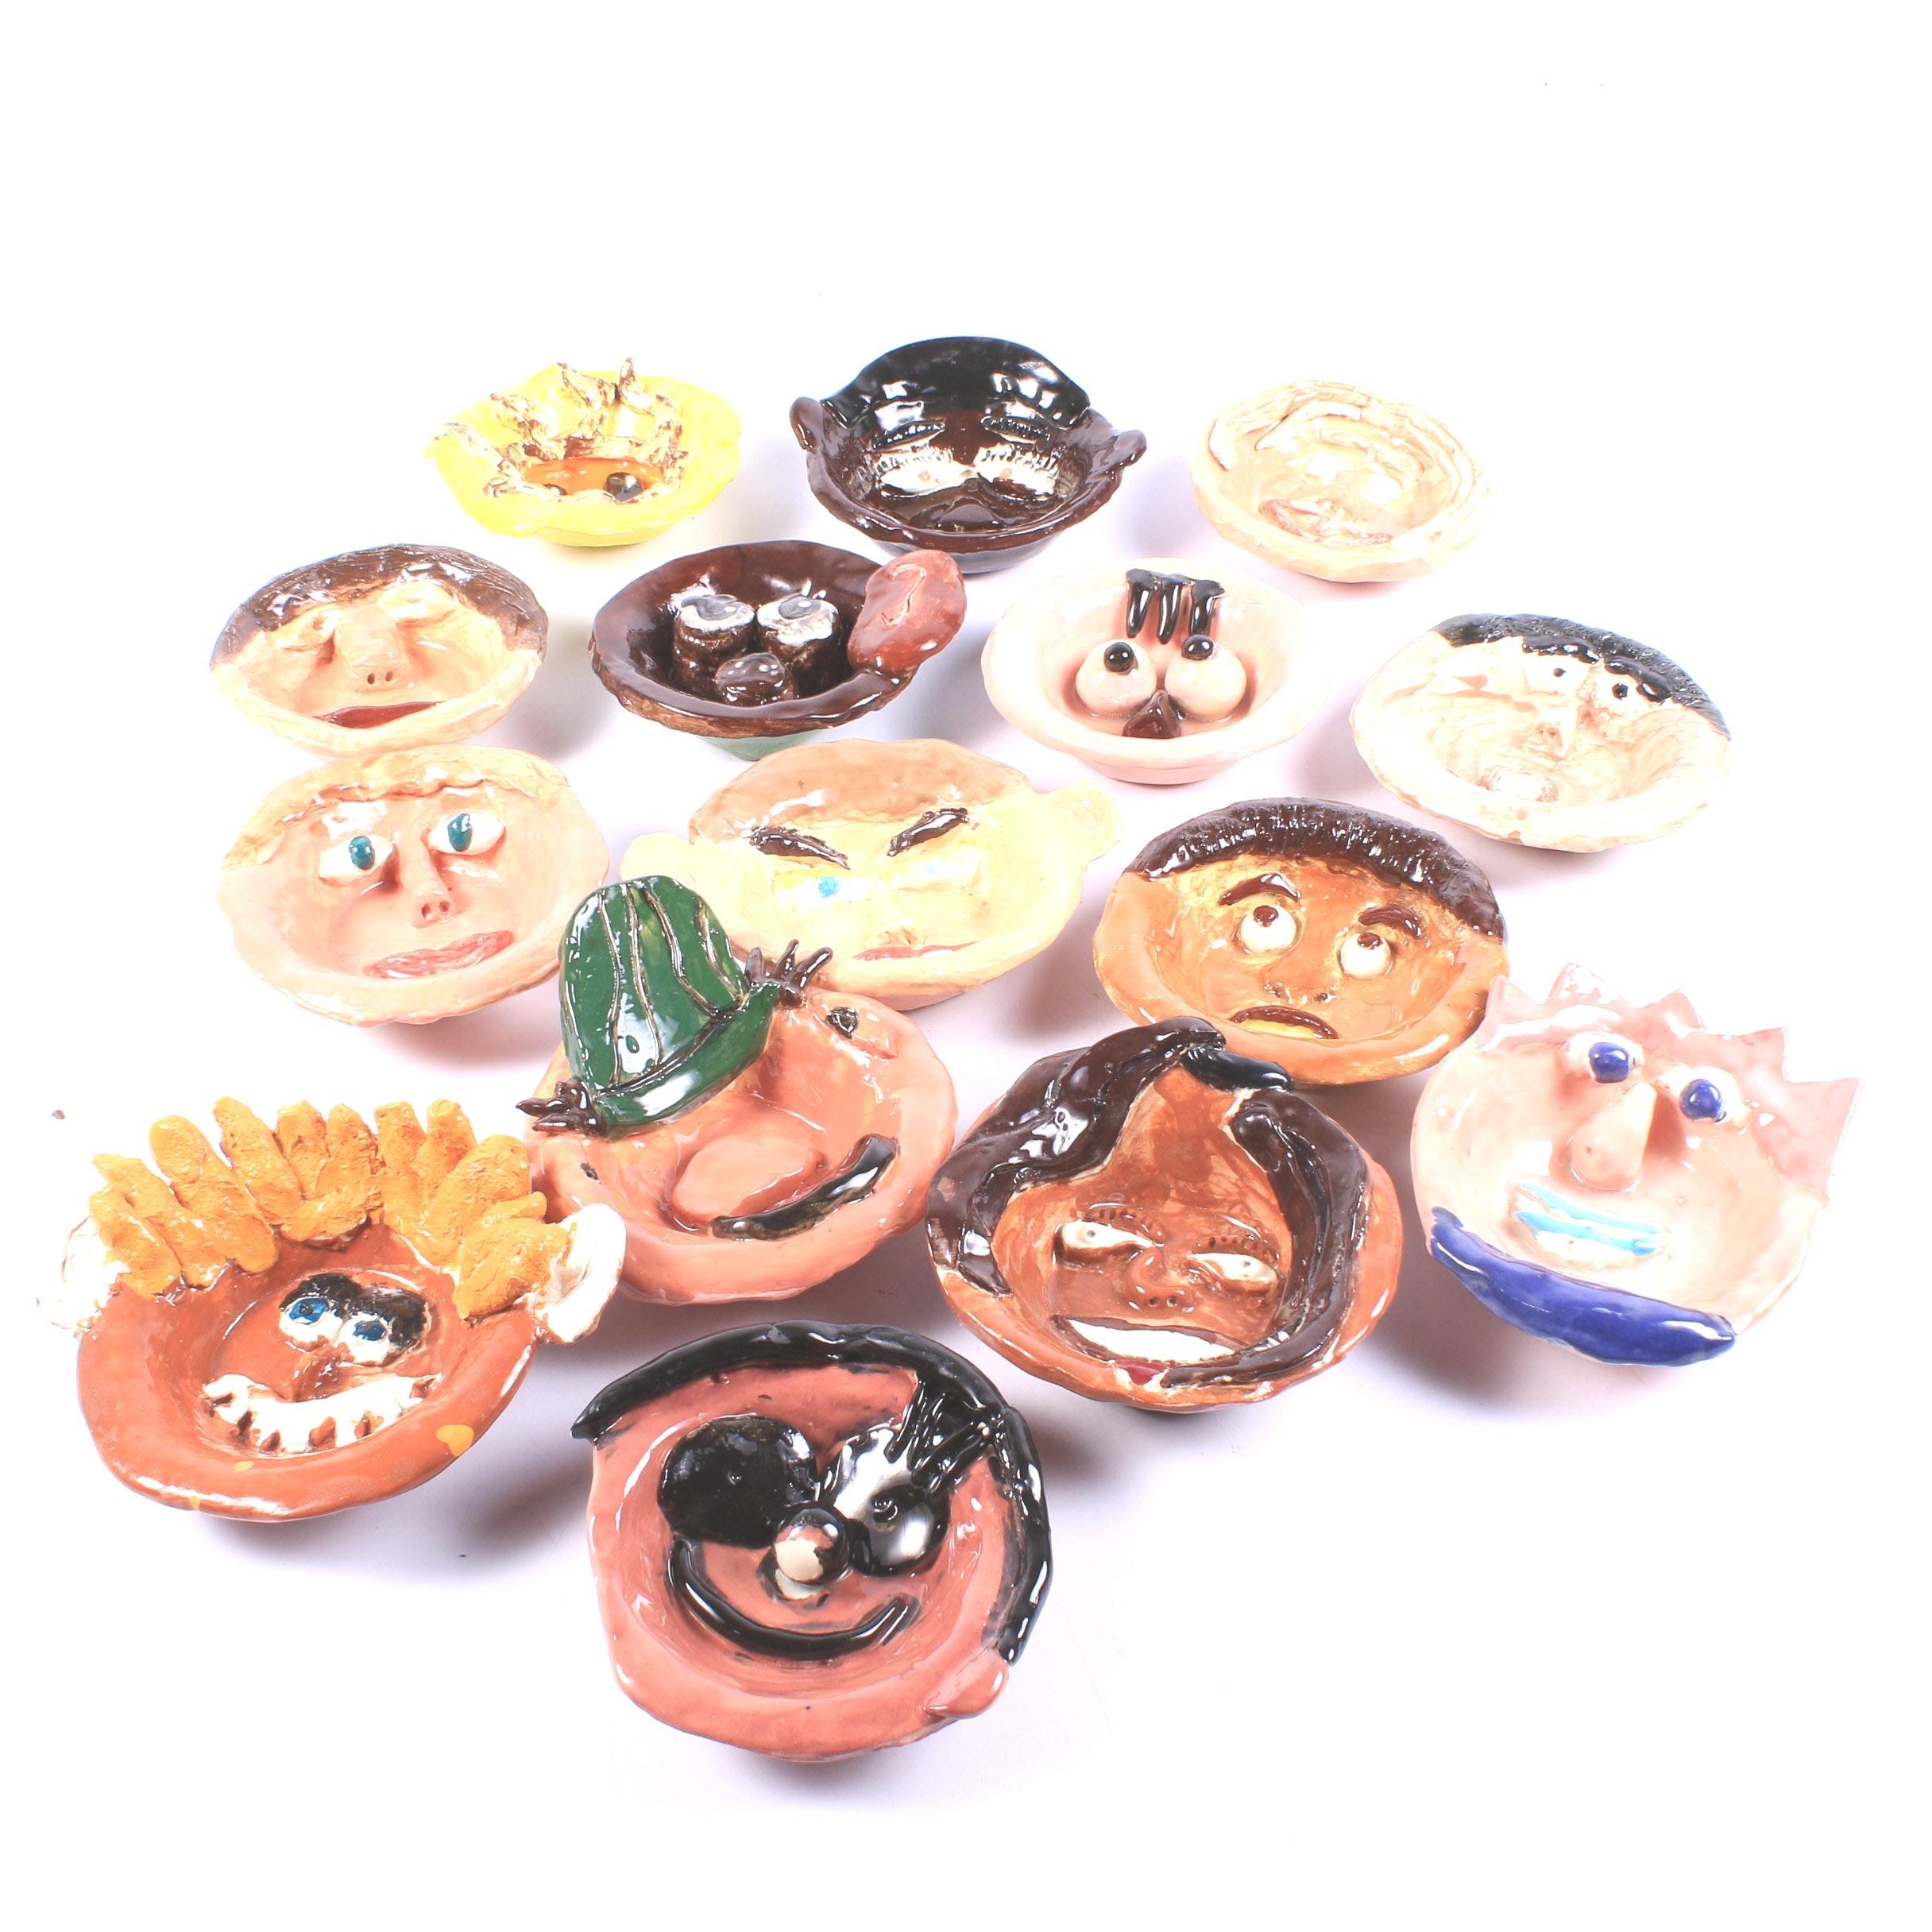 Hand Painted Folk Art Ceramic Face Bowls